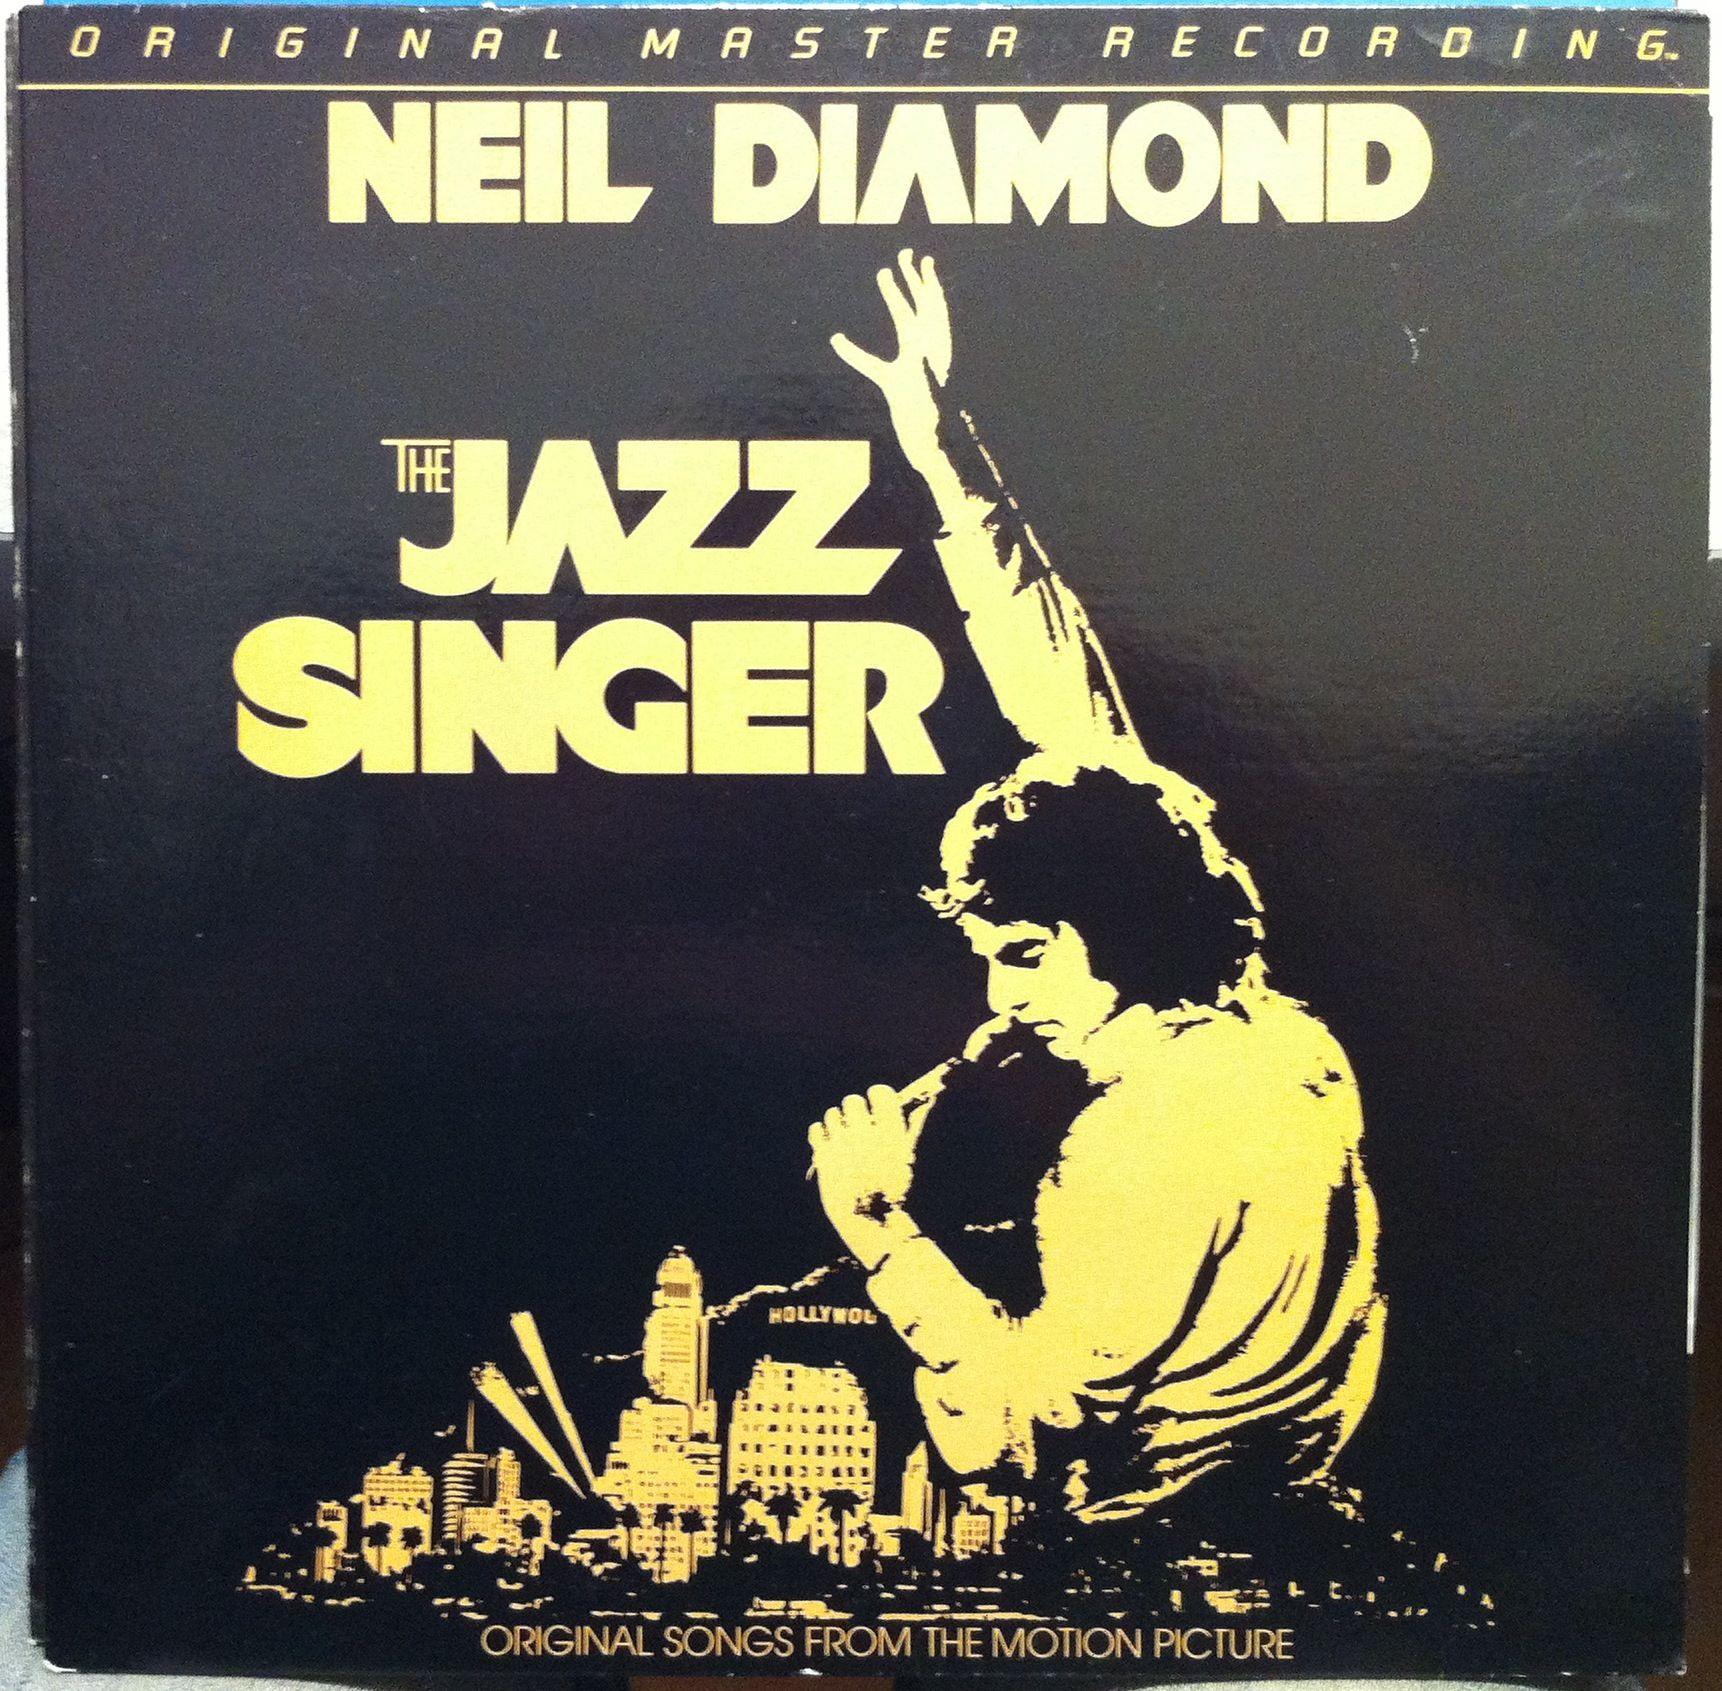 Mfsl 1 071 The Jazz Singer Neil Diamond The Jazz Singer Neil Diamond Neil Diamond Albums